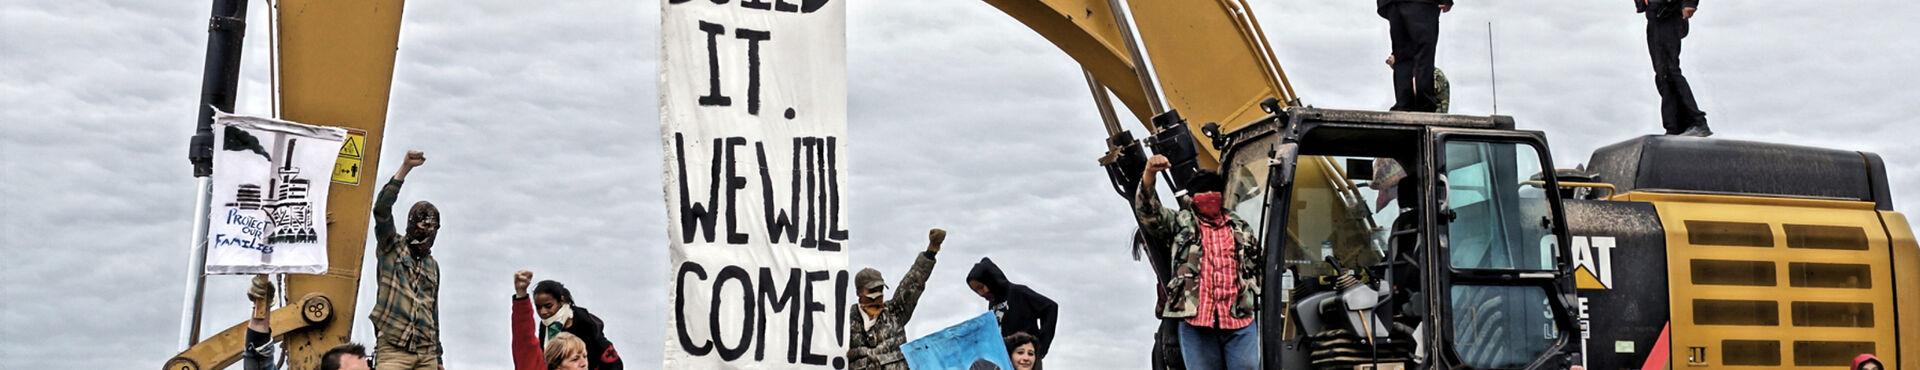 Banner - Peaceful Uprising